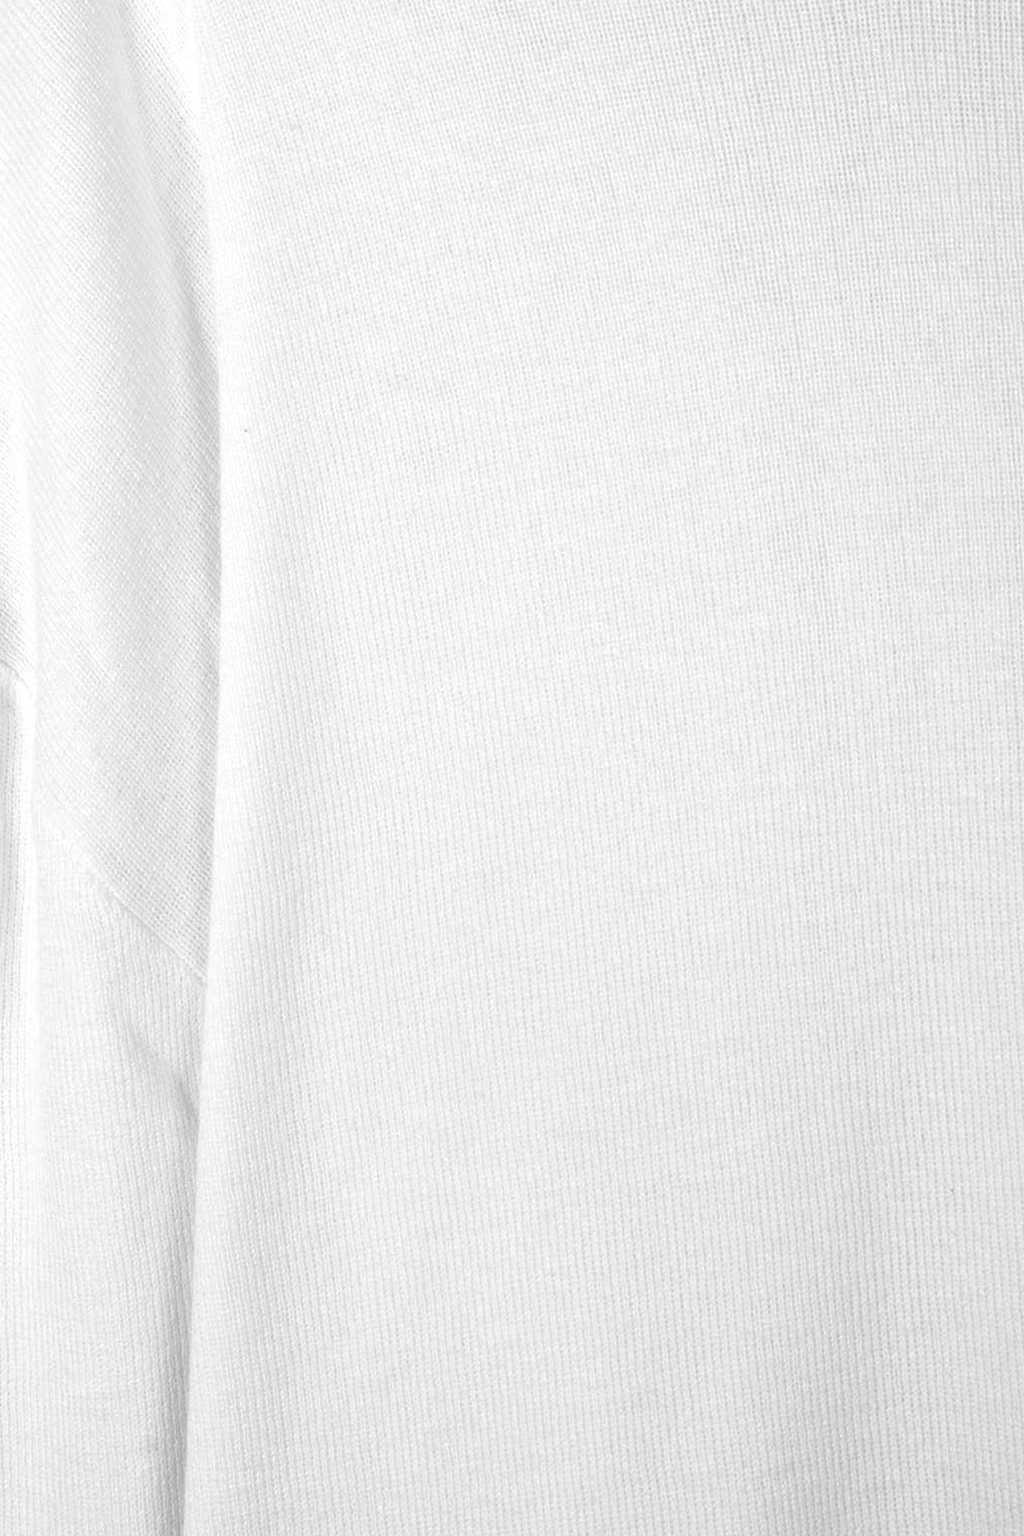 Sweater 1321 White 6